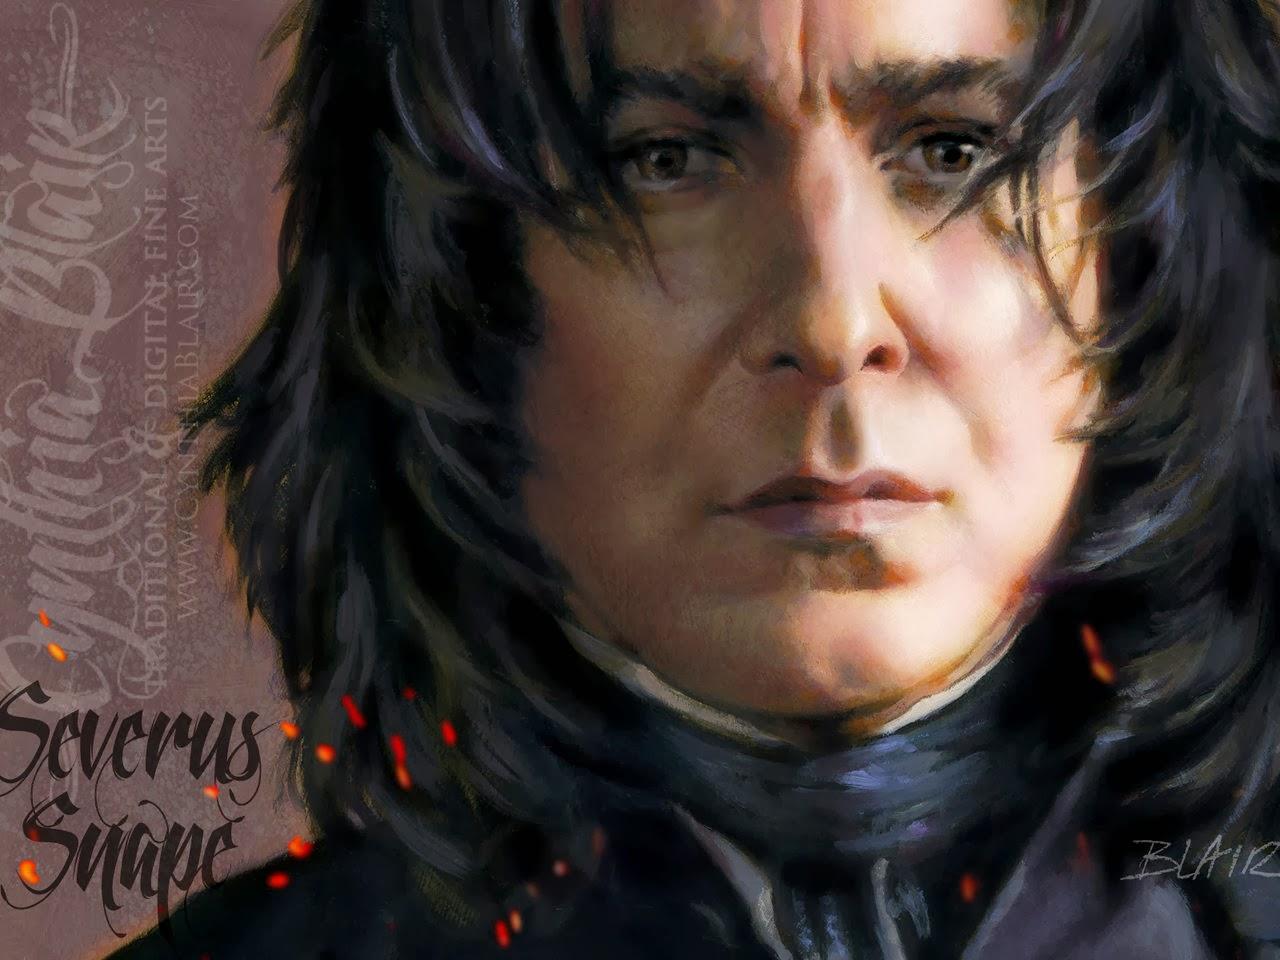 Free Desktop Wallpaper Severus Snape Wallpaper